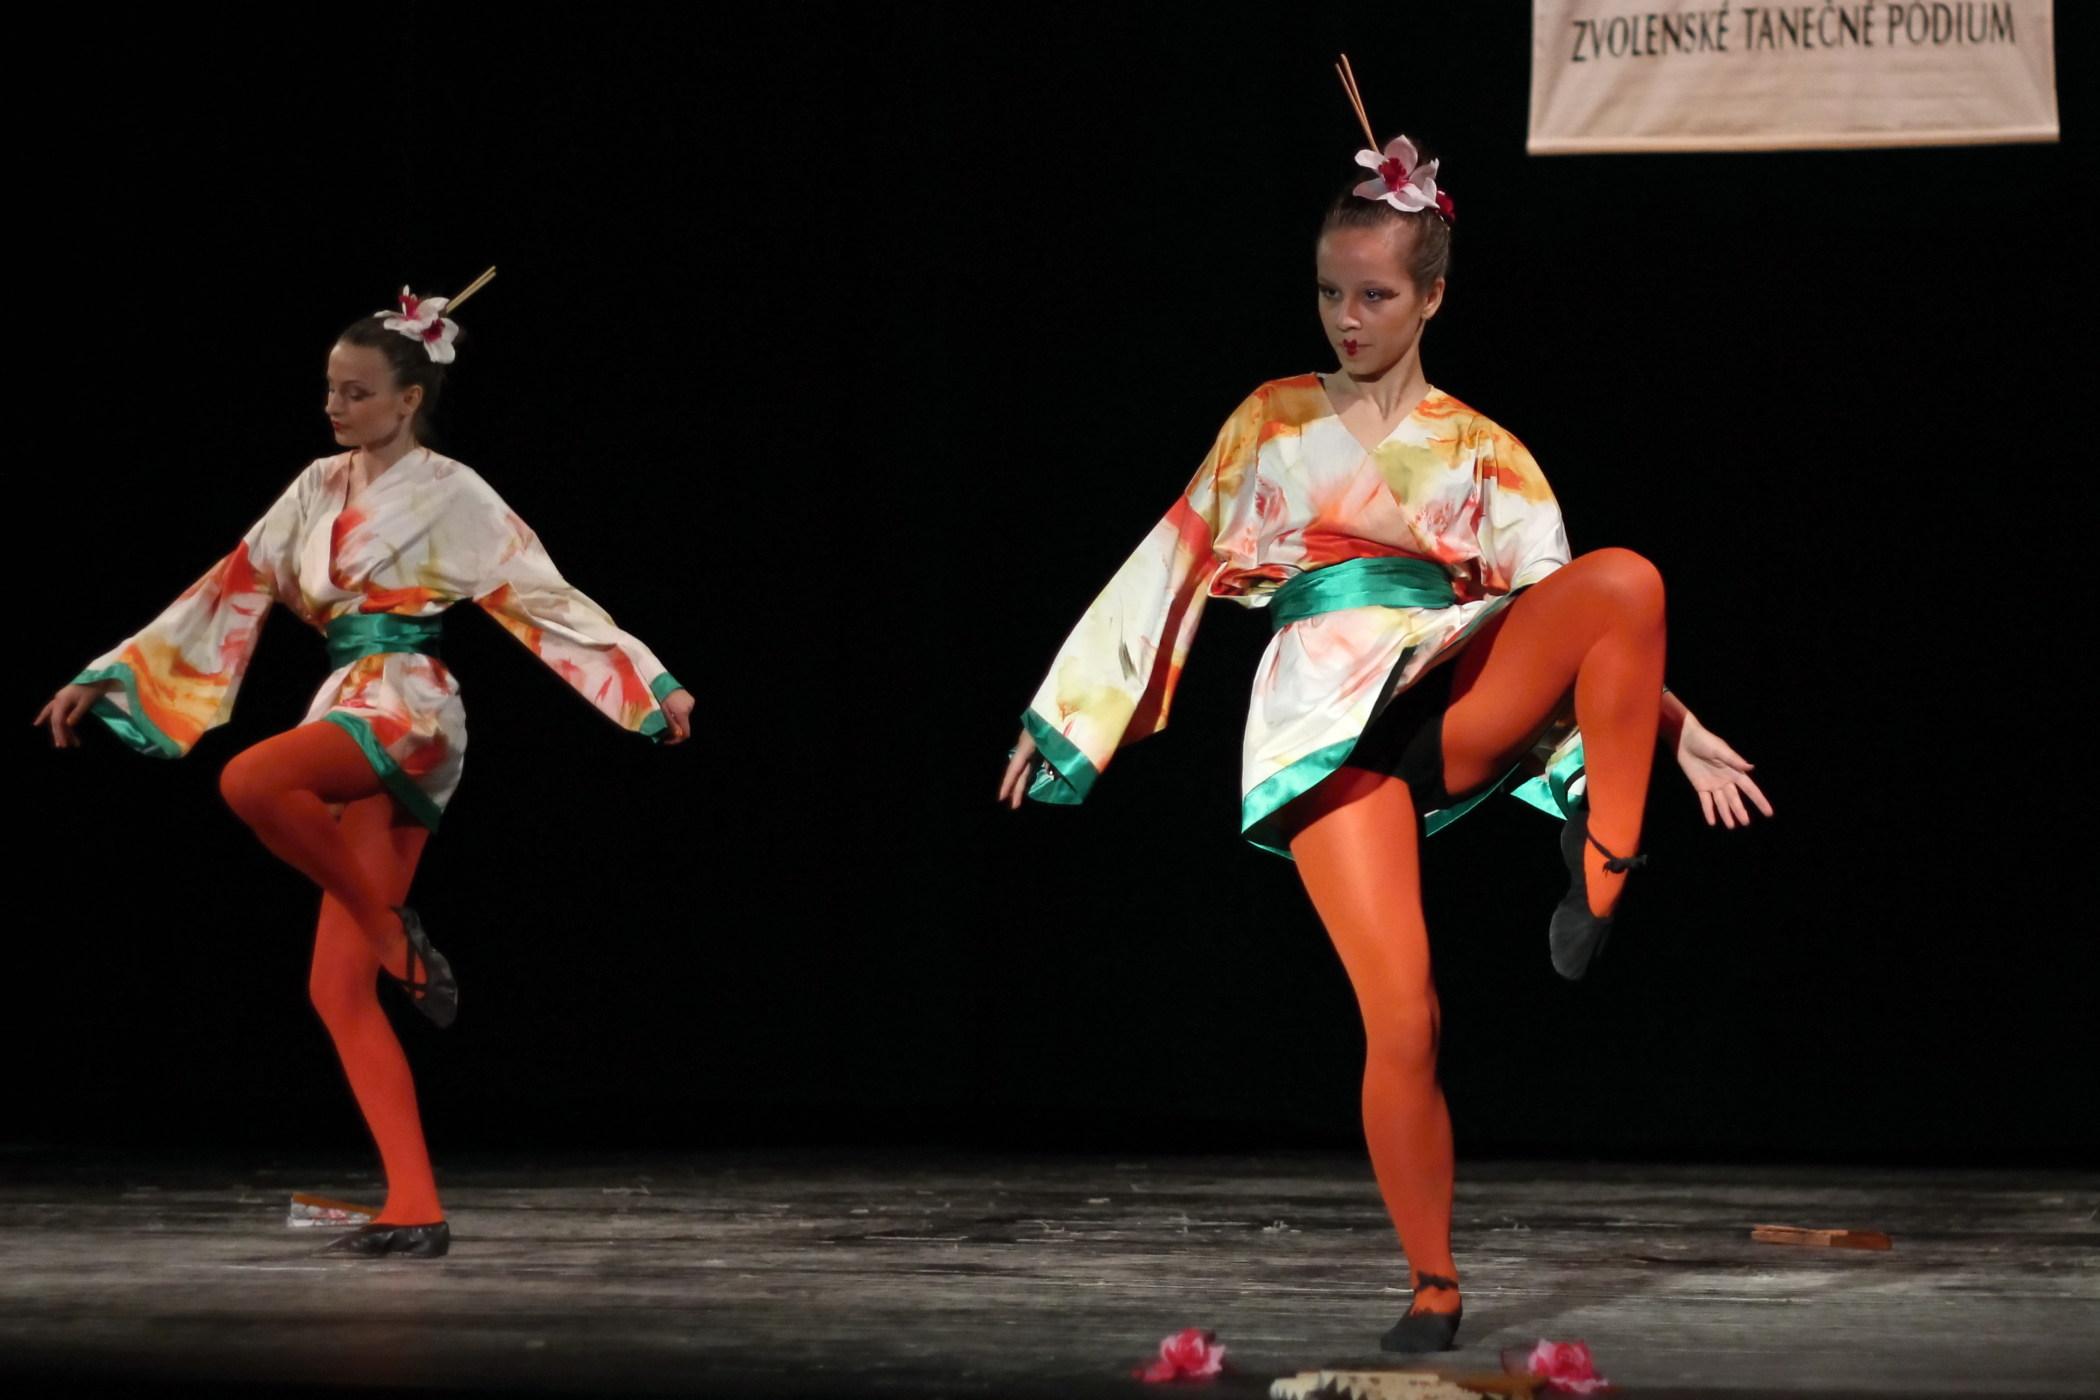 zvolenske-tanecne-podium-28